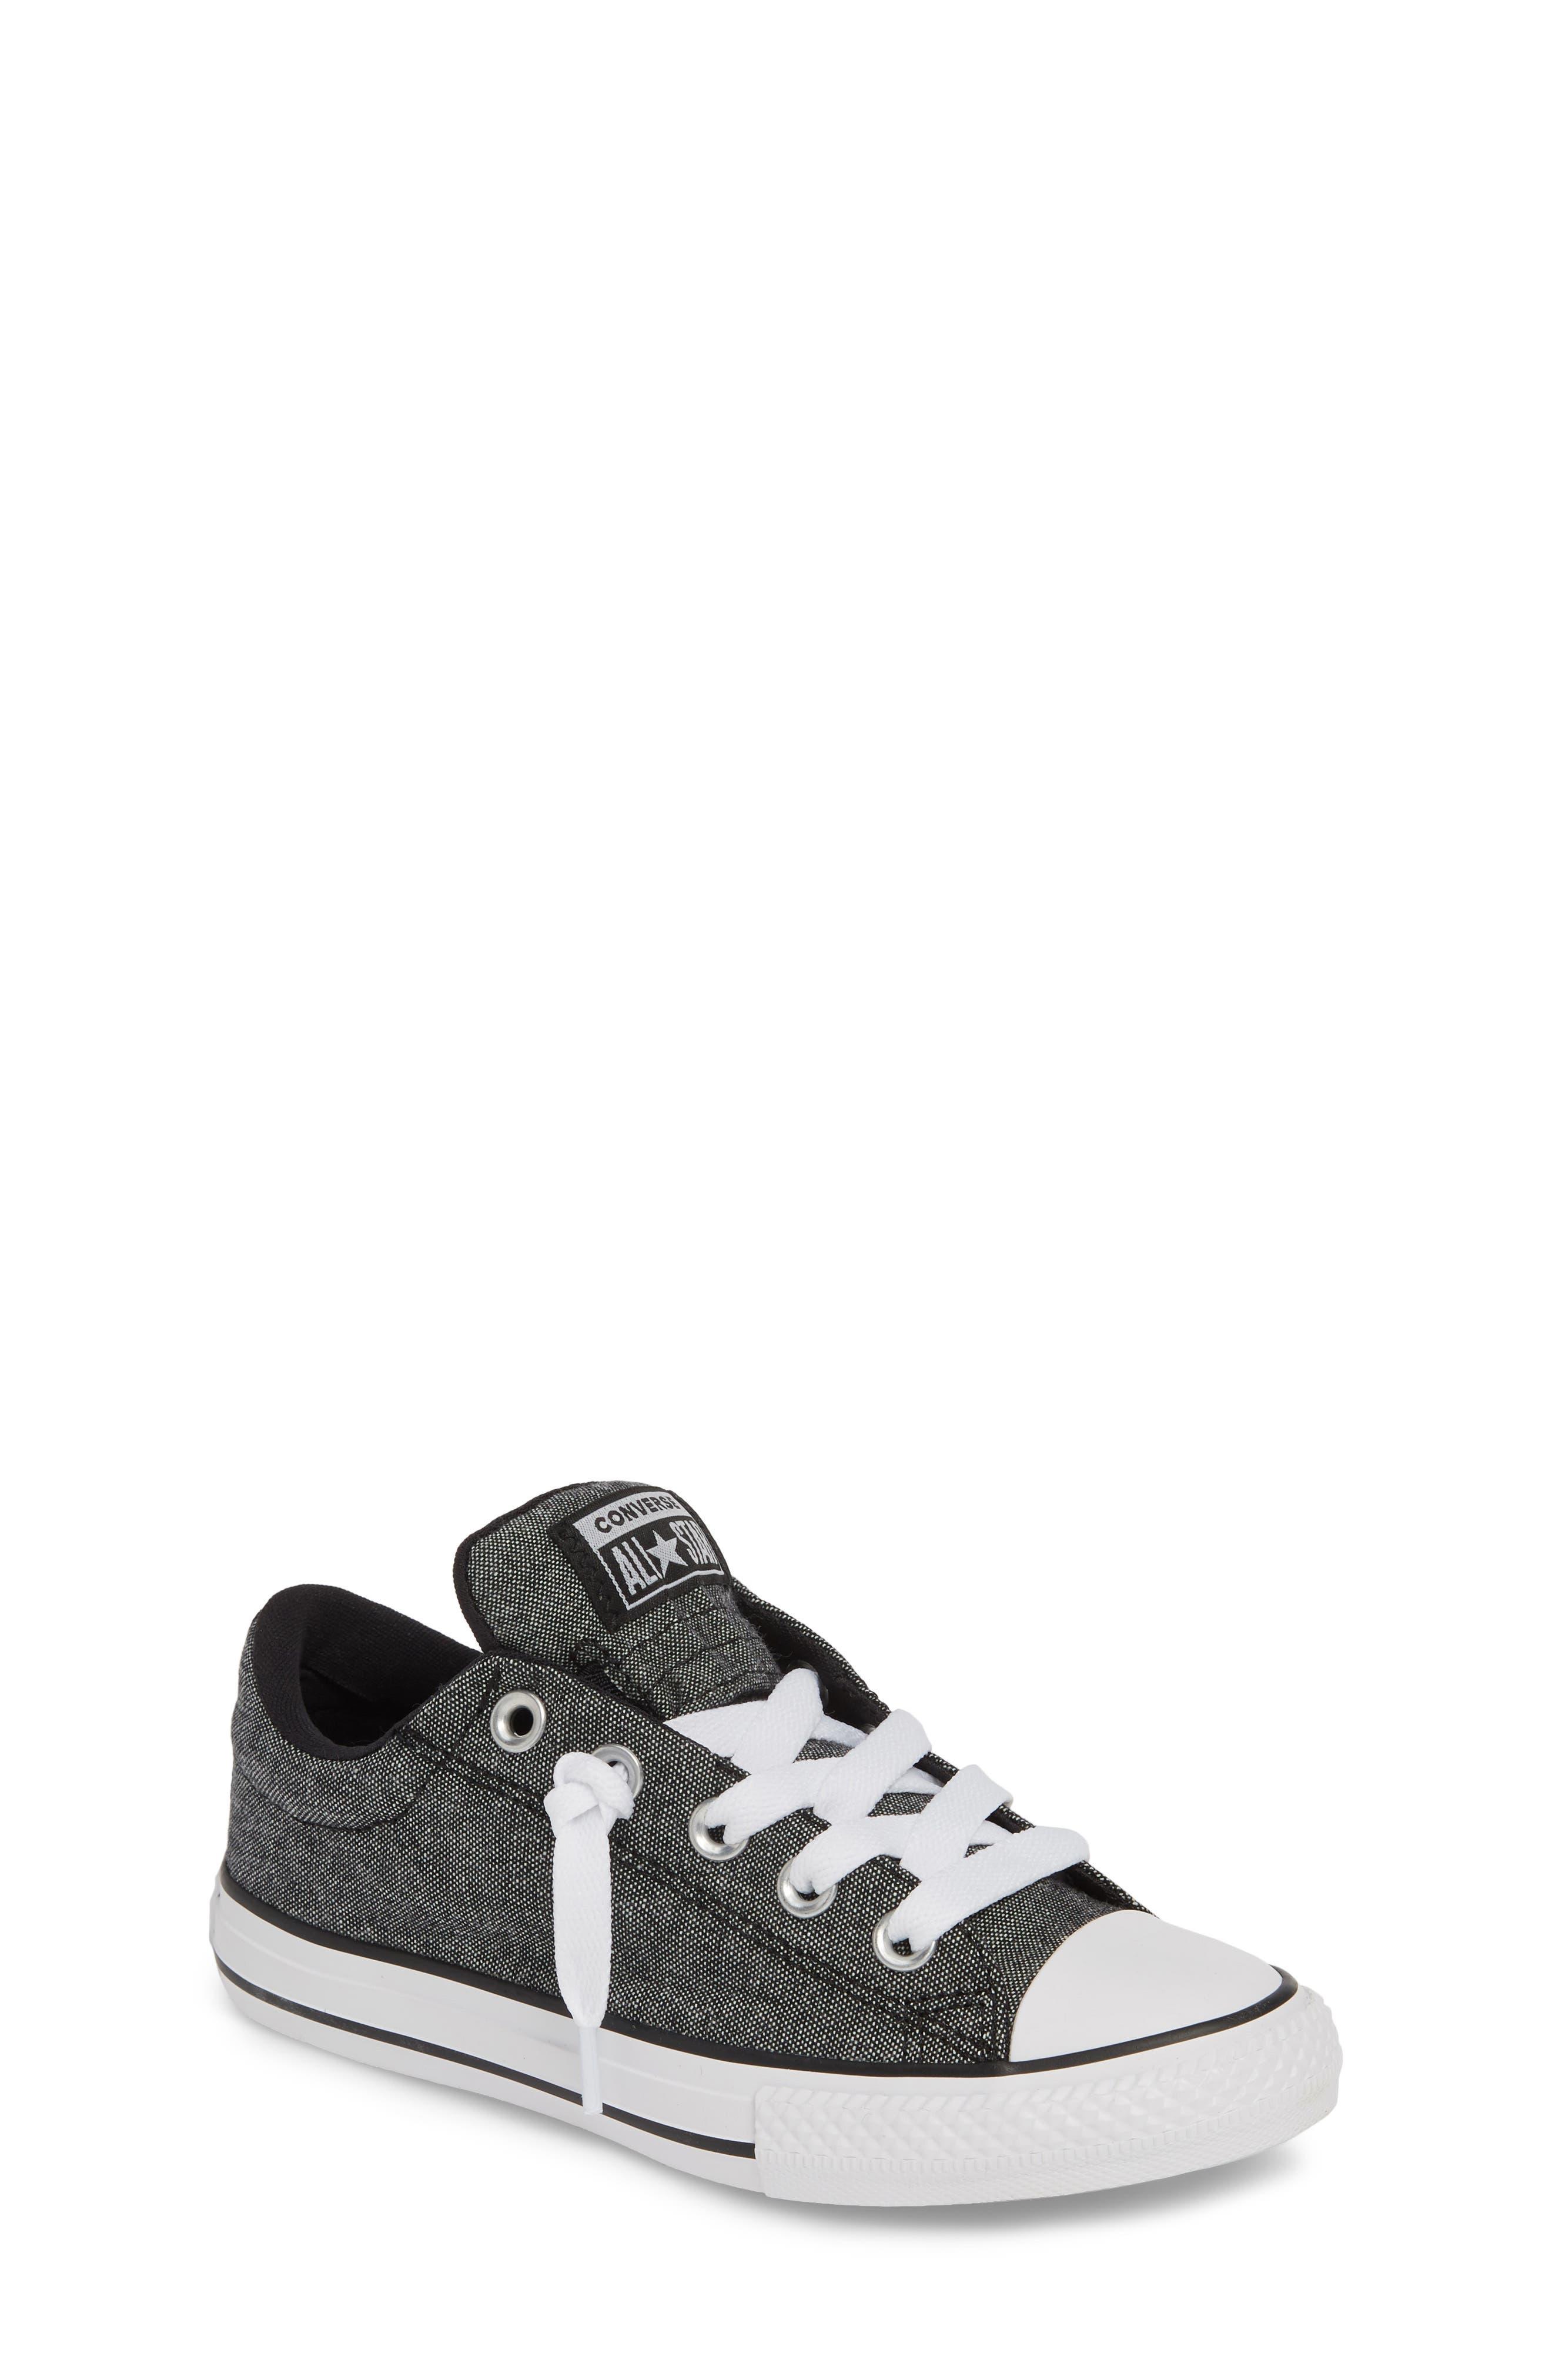 ,                             Chuck Taylor<sup>®</sup> All Star<sup>®</sup> Street Sneaker,                             Main thumbnail 1, color,                             BLACK/ BLACK/ WHITE